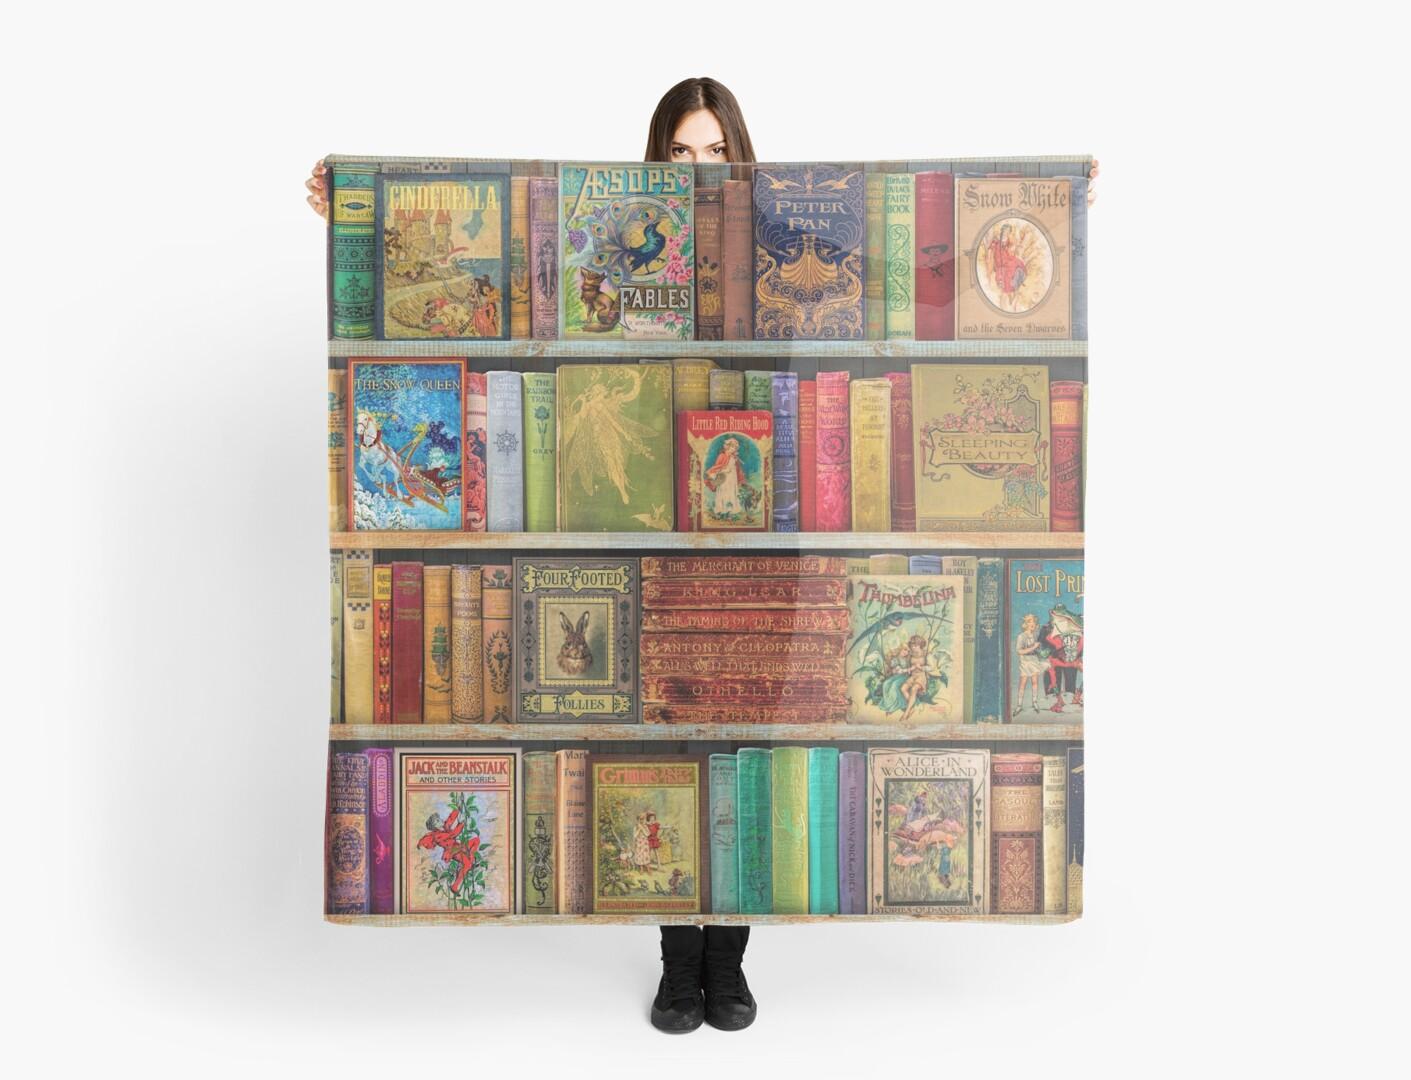 A Daydreamer's Book Shelf by Aimee Stewart